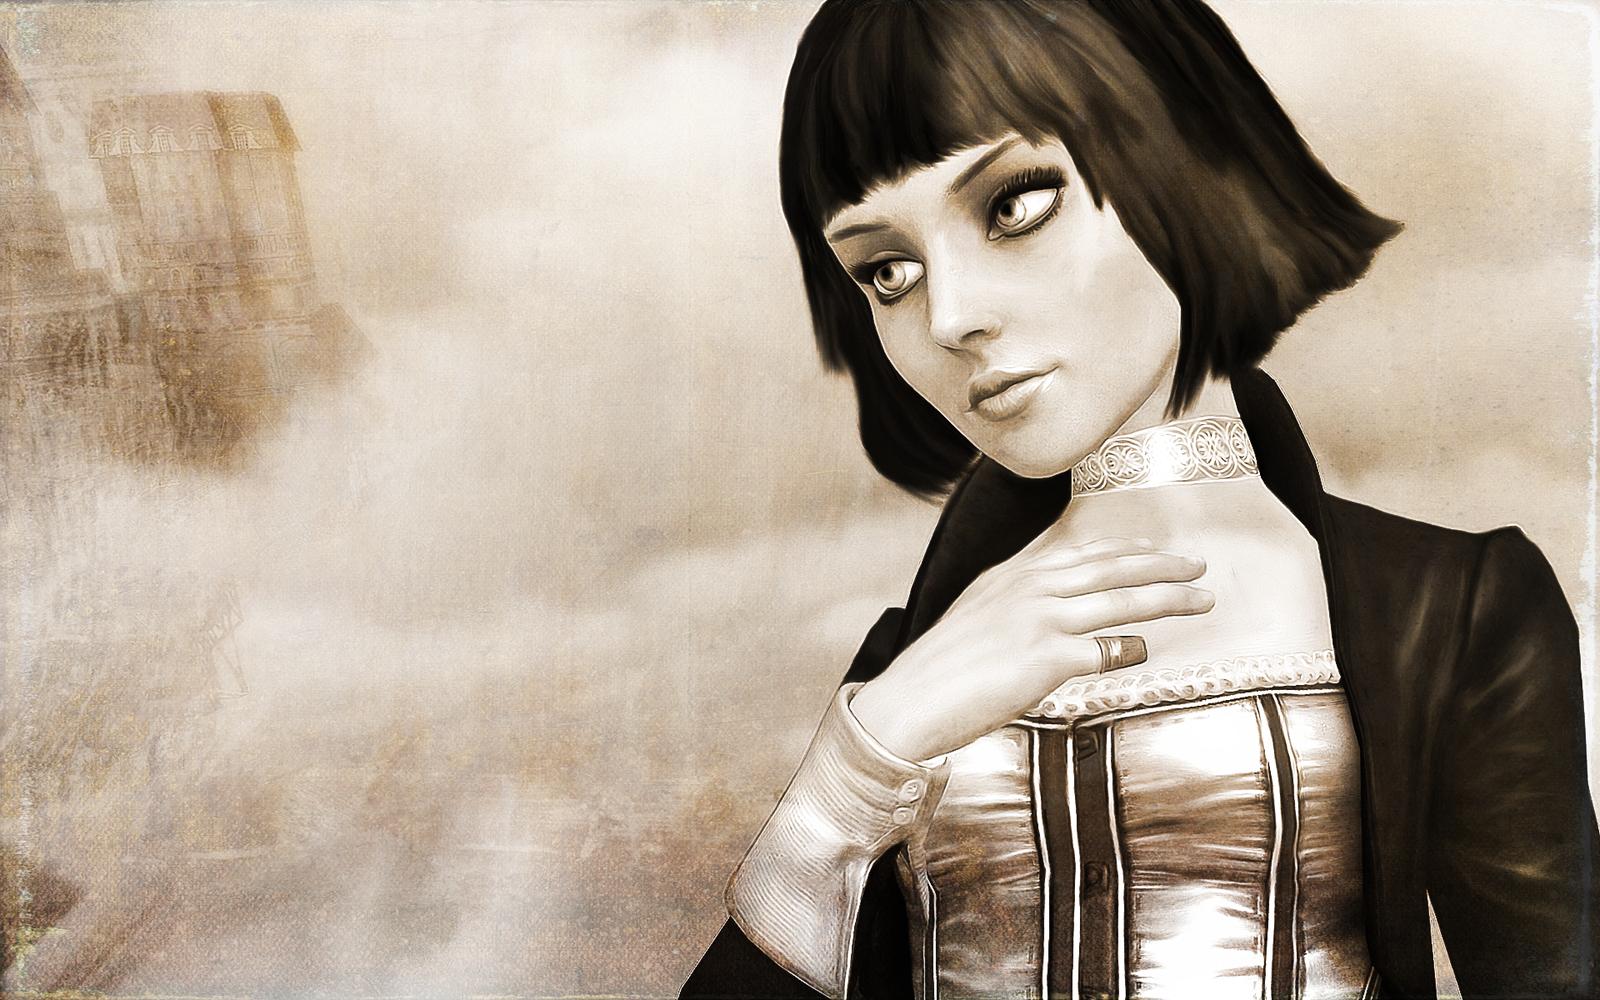 Bioshock Infinite - Elizabeth Columbia Wallpaper by WhrAreMyDragons